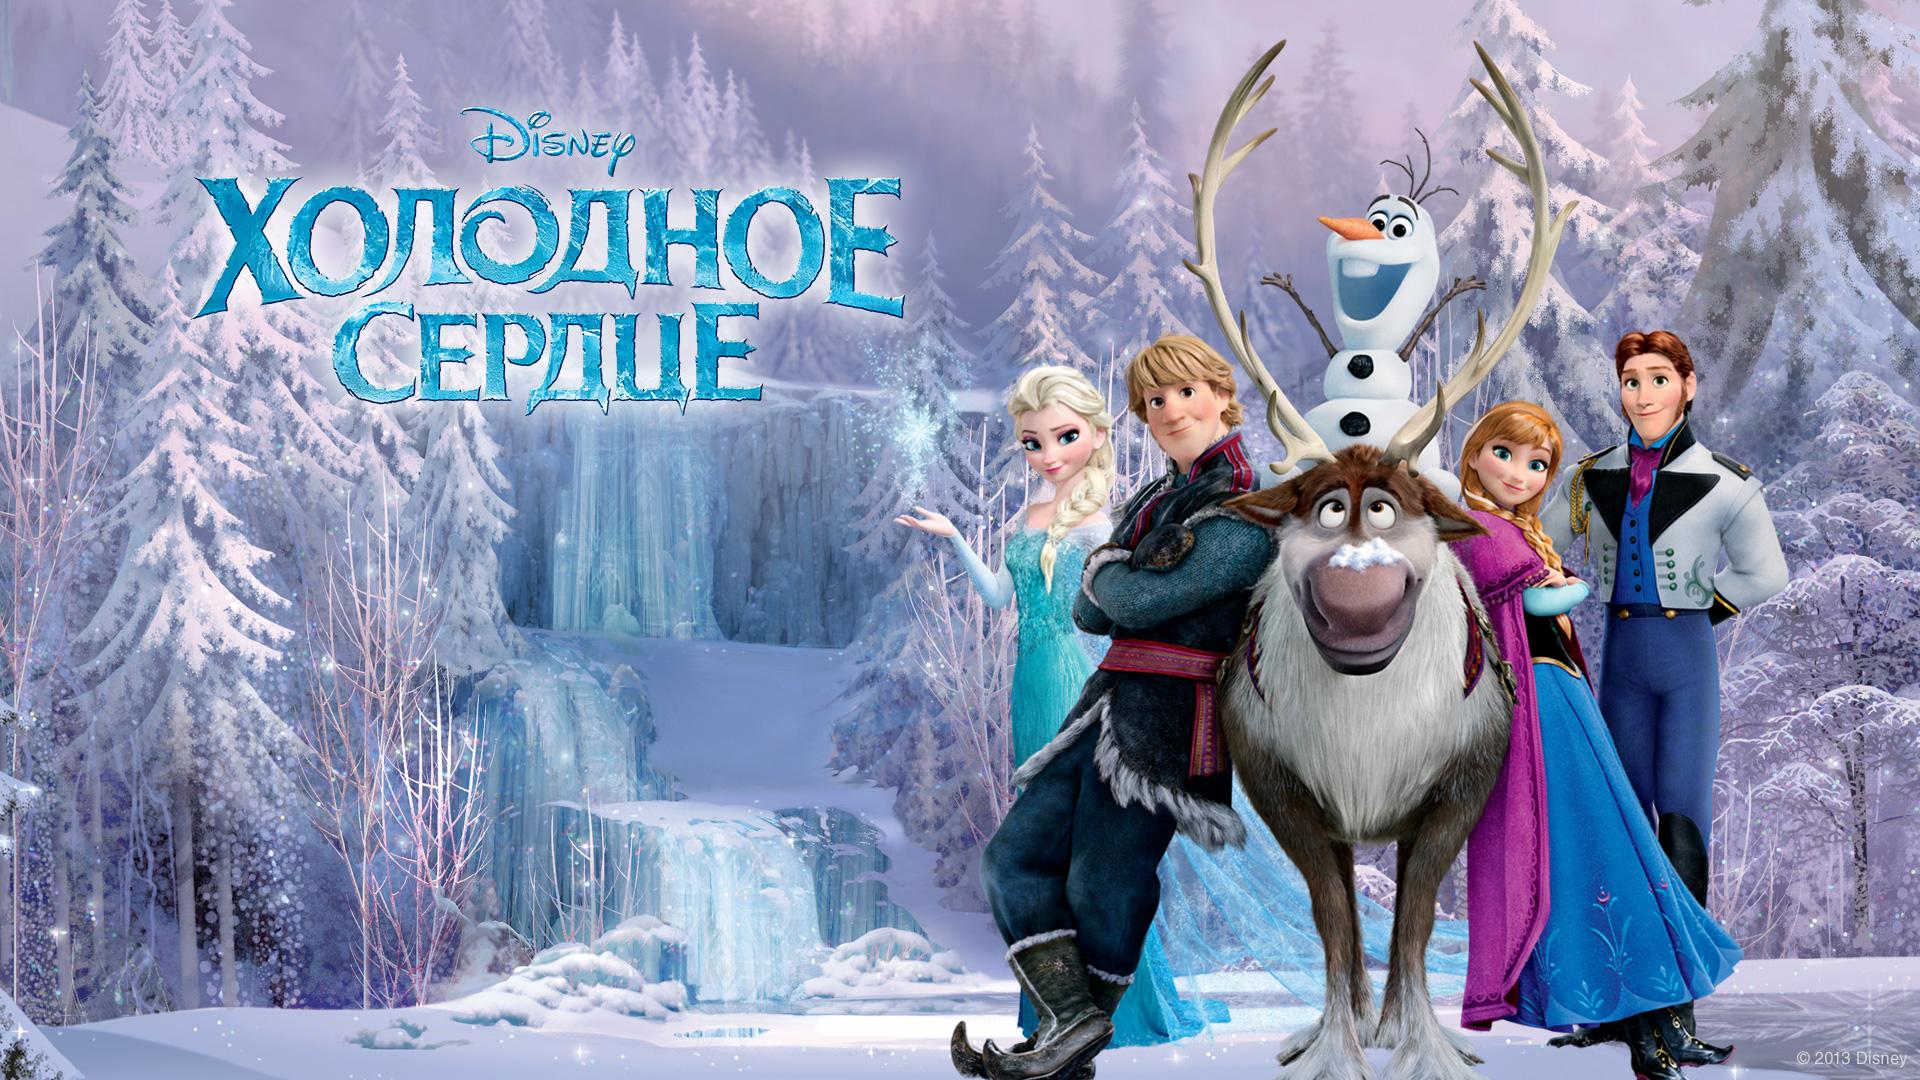 Best Ideas About Frozen Wallpaper On Pinterest Elsa 1920x1080